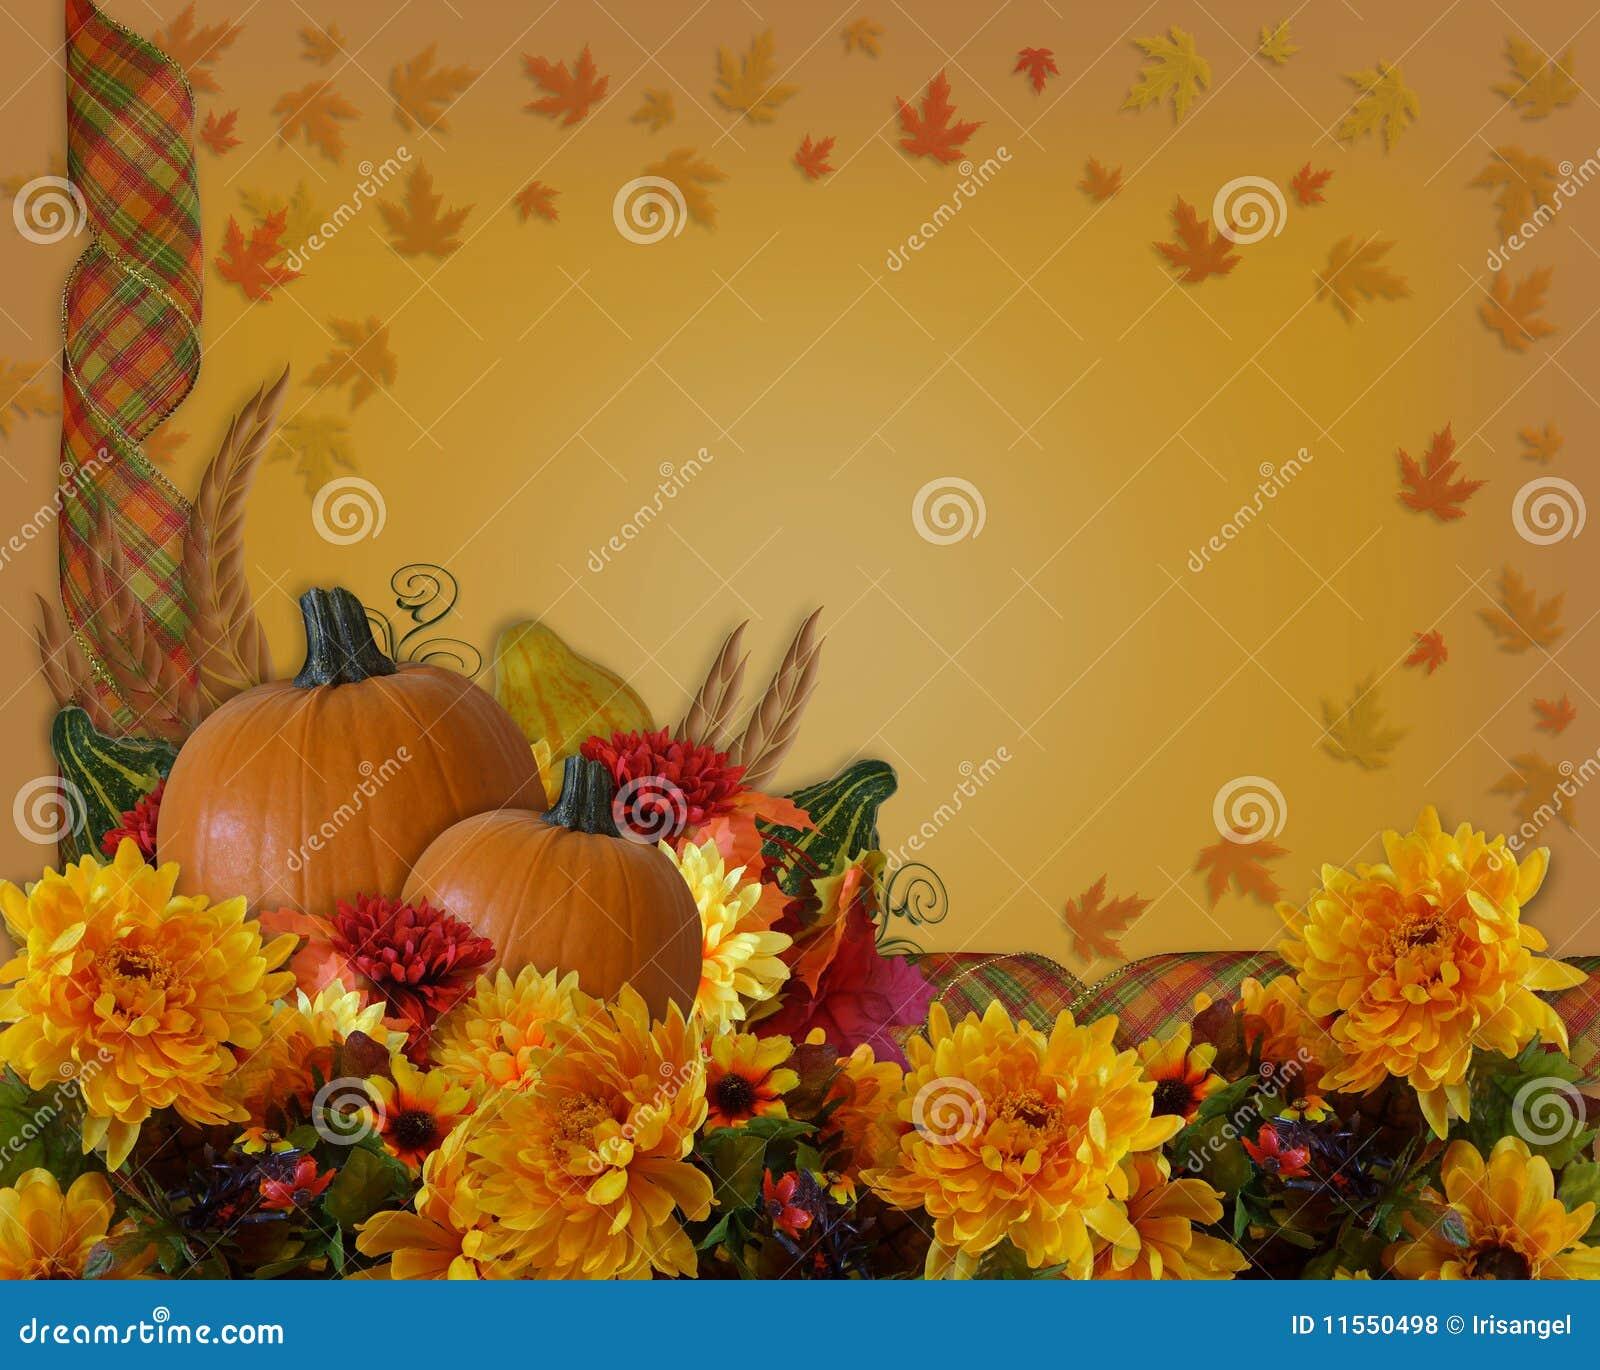 Fall Wallpaper Images Free: Thanksgiving Autumn Background Border Stock Illustration